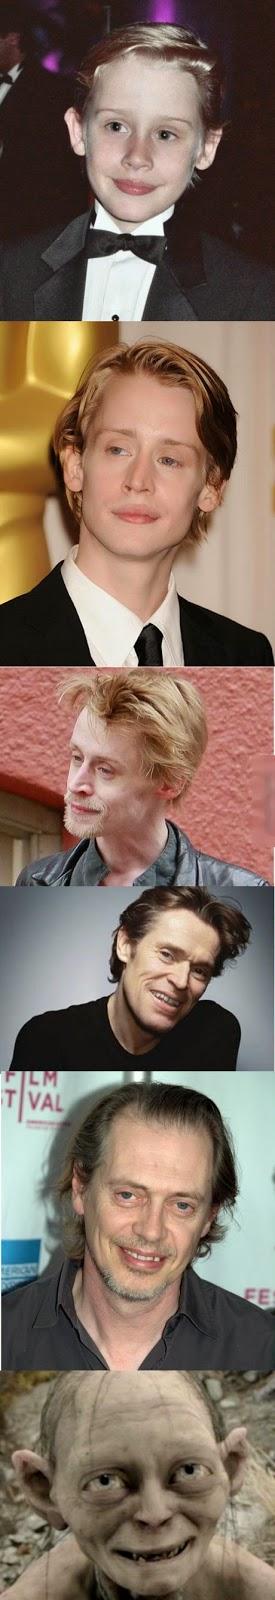 Evolução de Macaulay Culkin